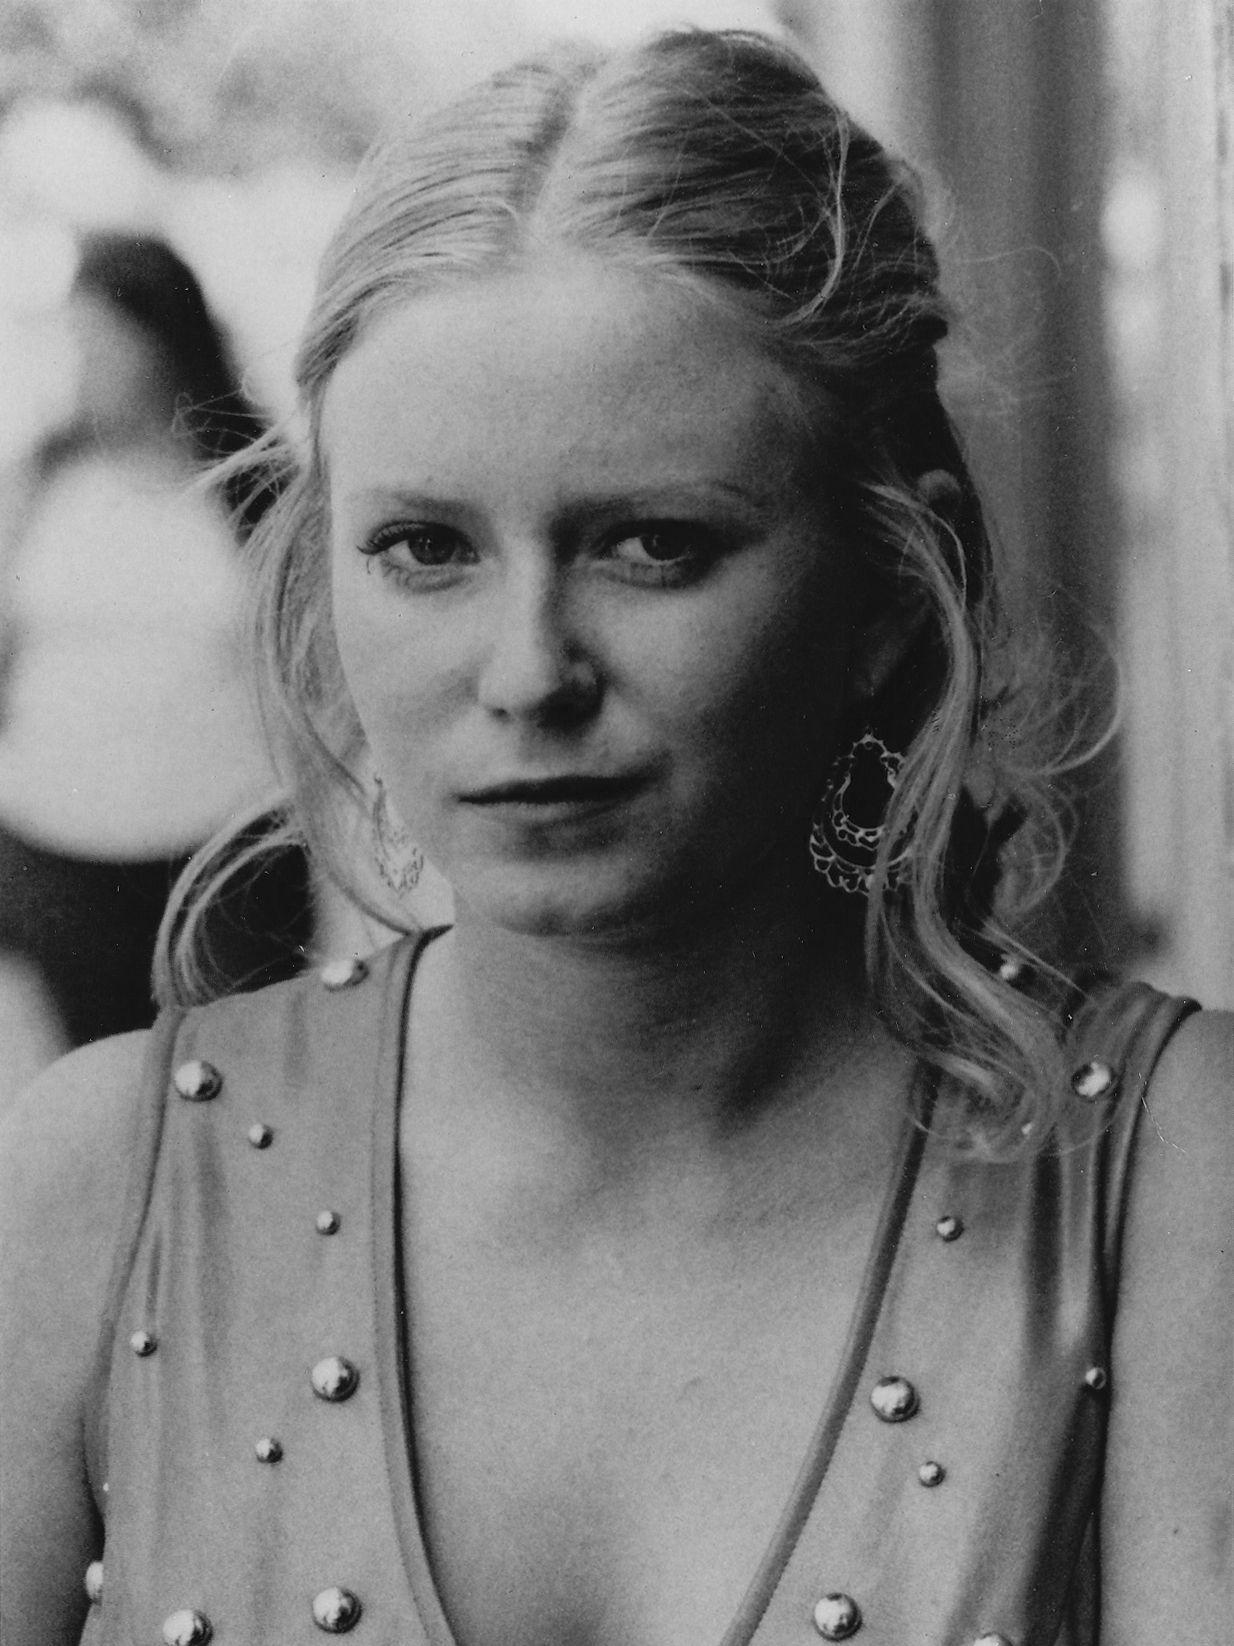 Emma Thompson (born 1959),John Mahoney (1940?018) Hot images 47. Tina Fey,Deborah Watling (born 1948)